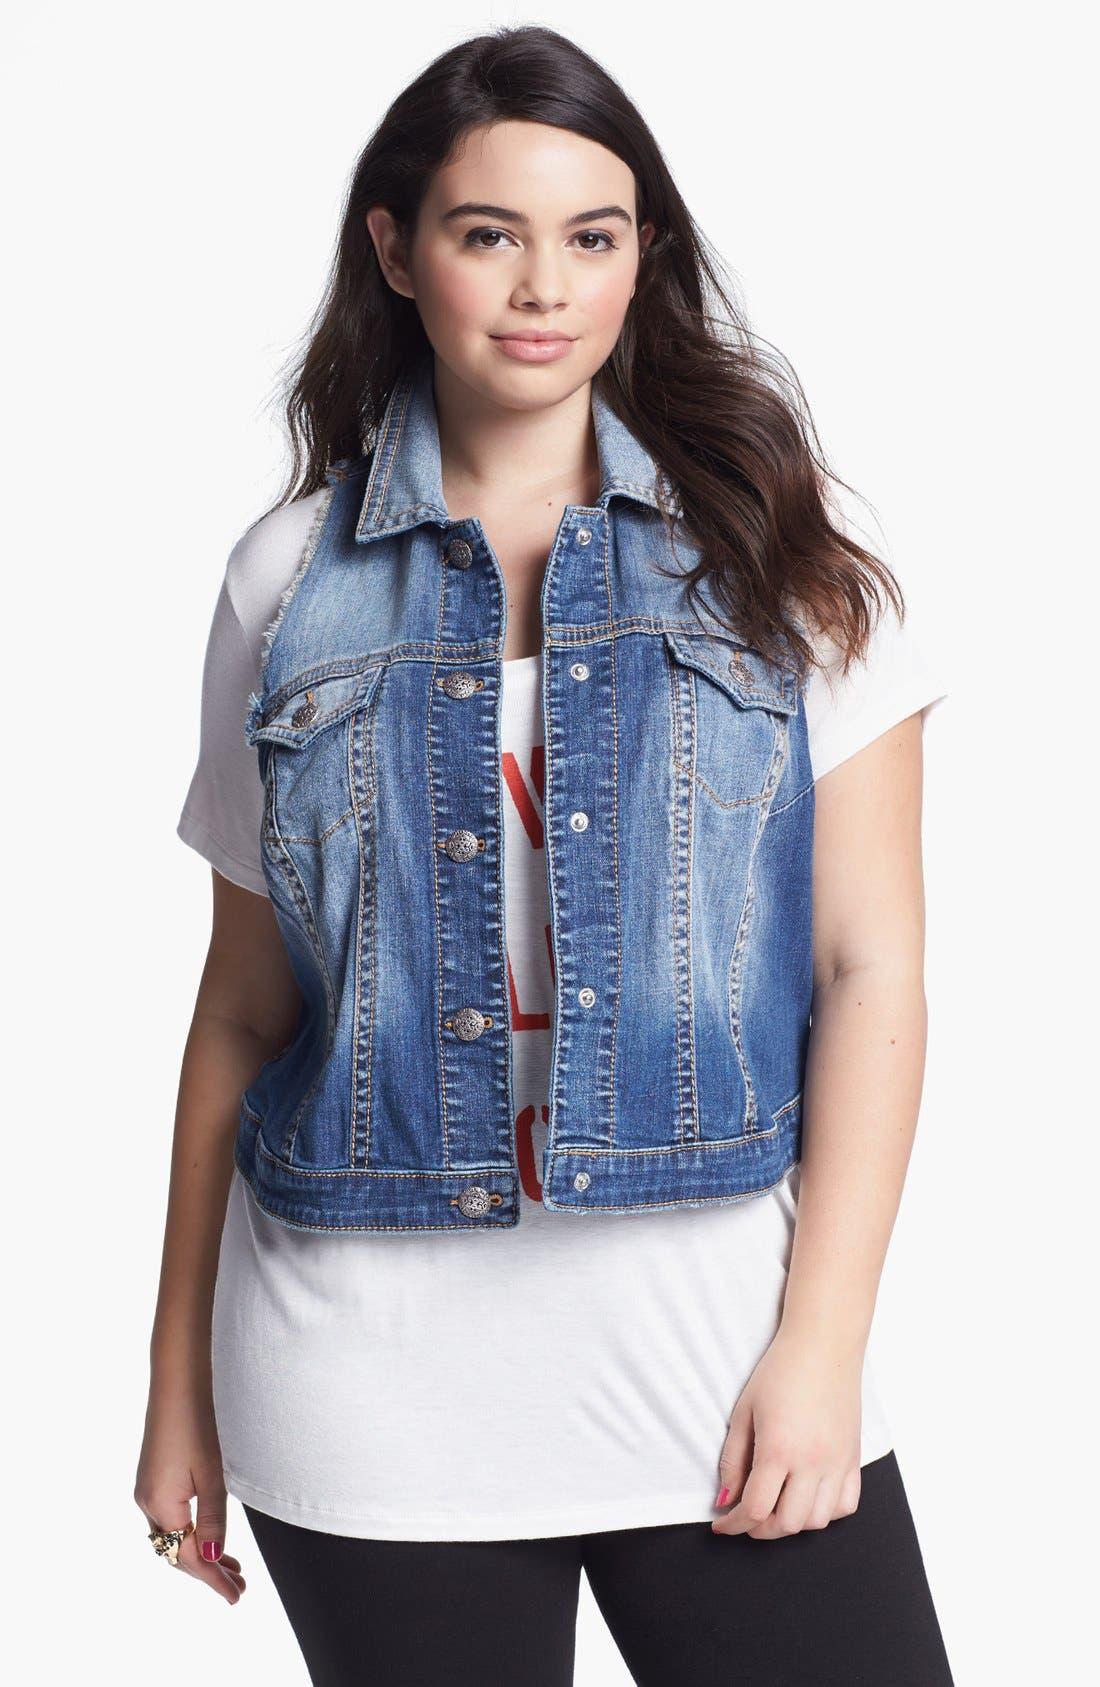 Alternate Image 1 Selected - Silver Jeans Co. Denim Vest (Juniors Plus)